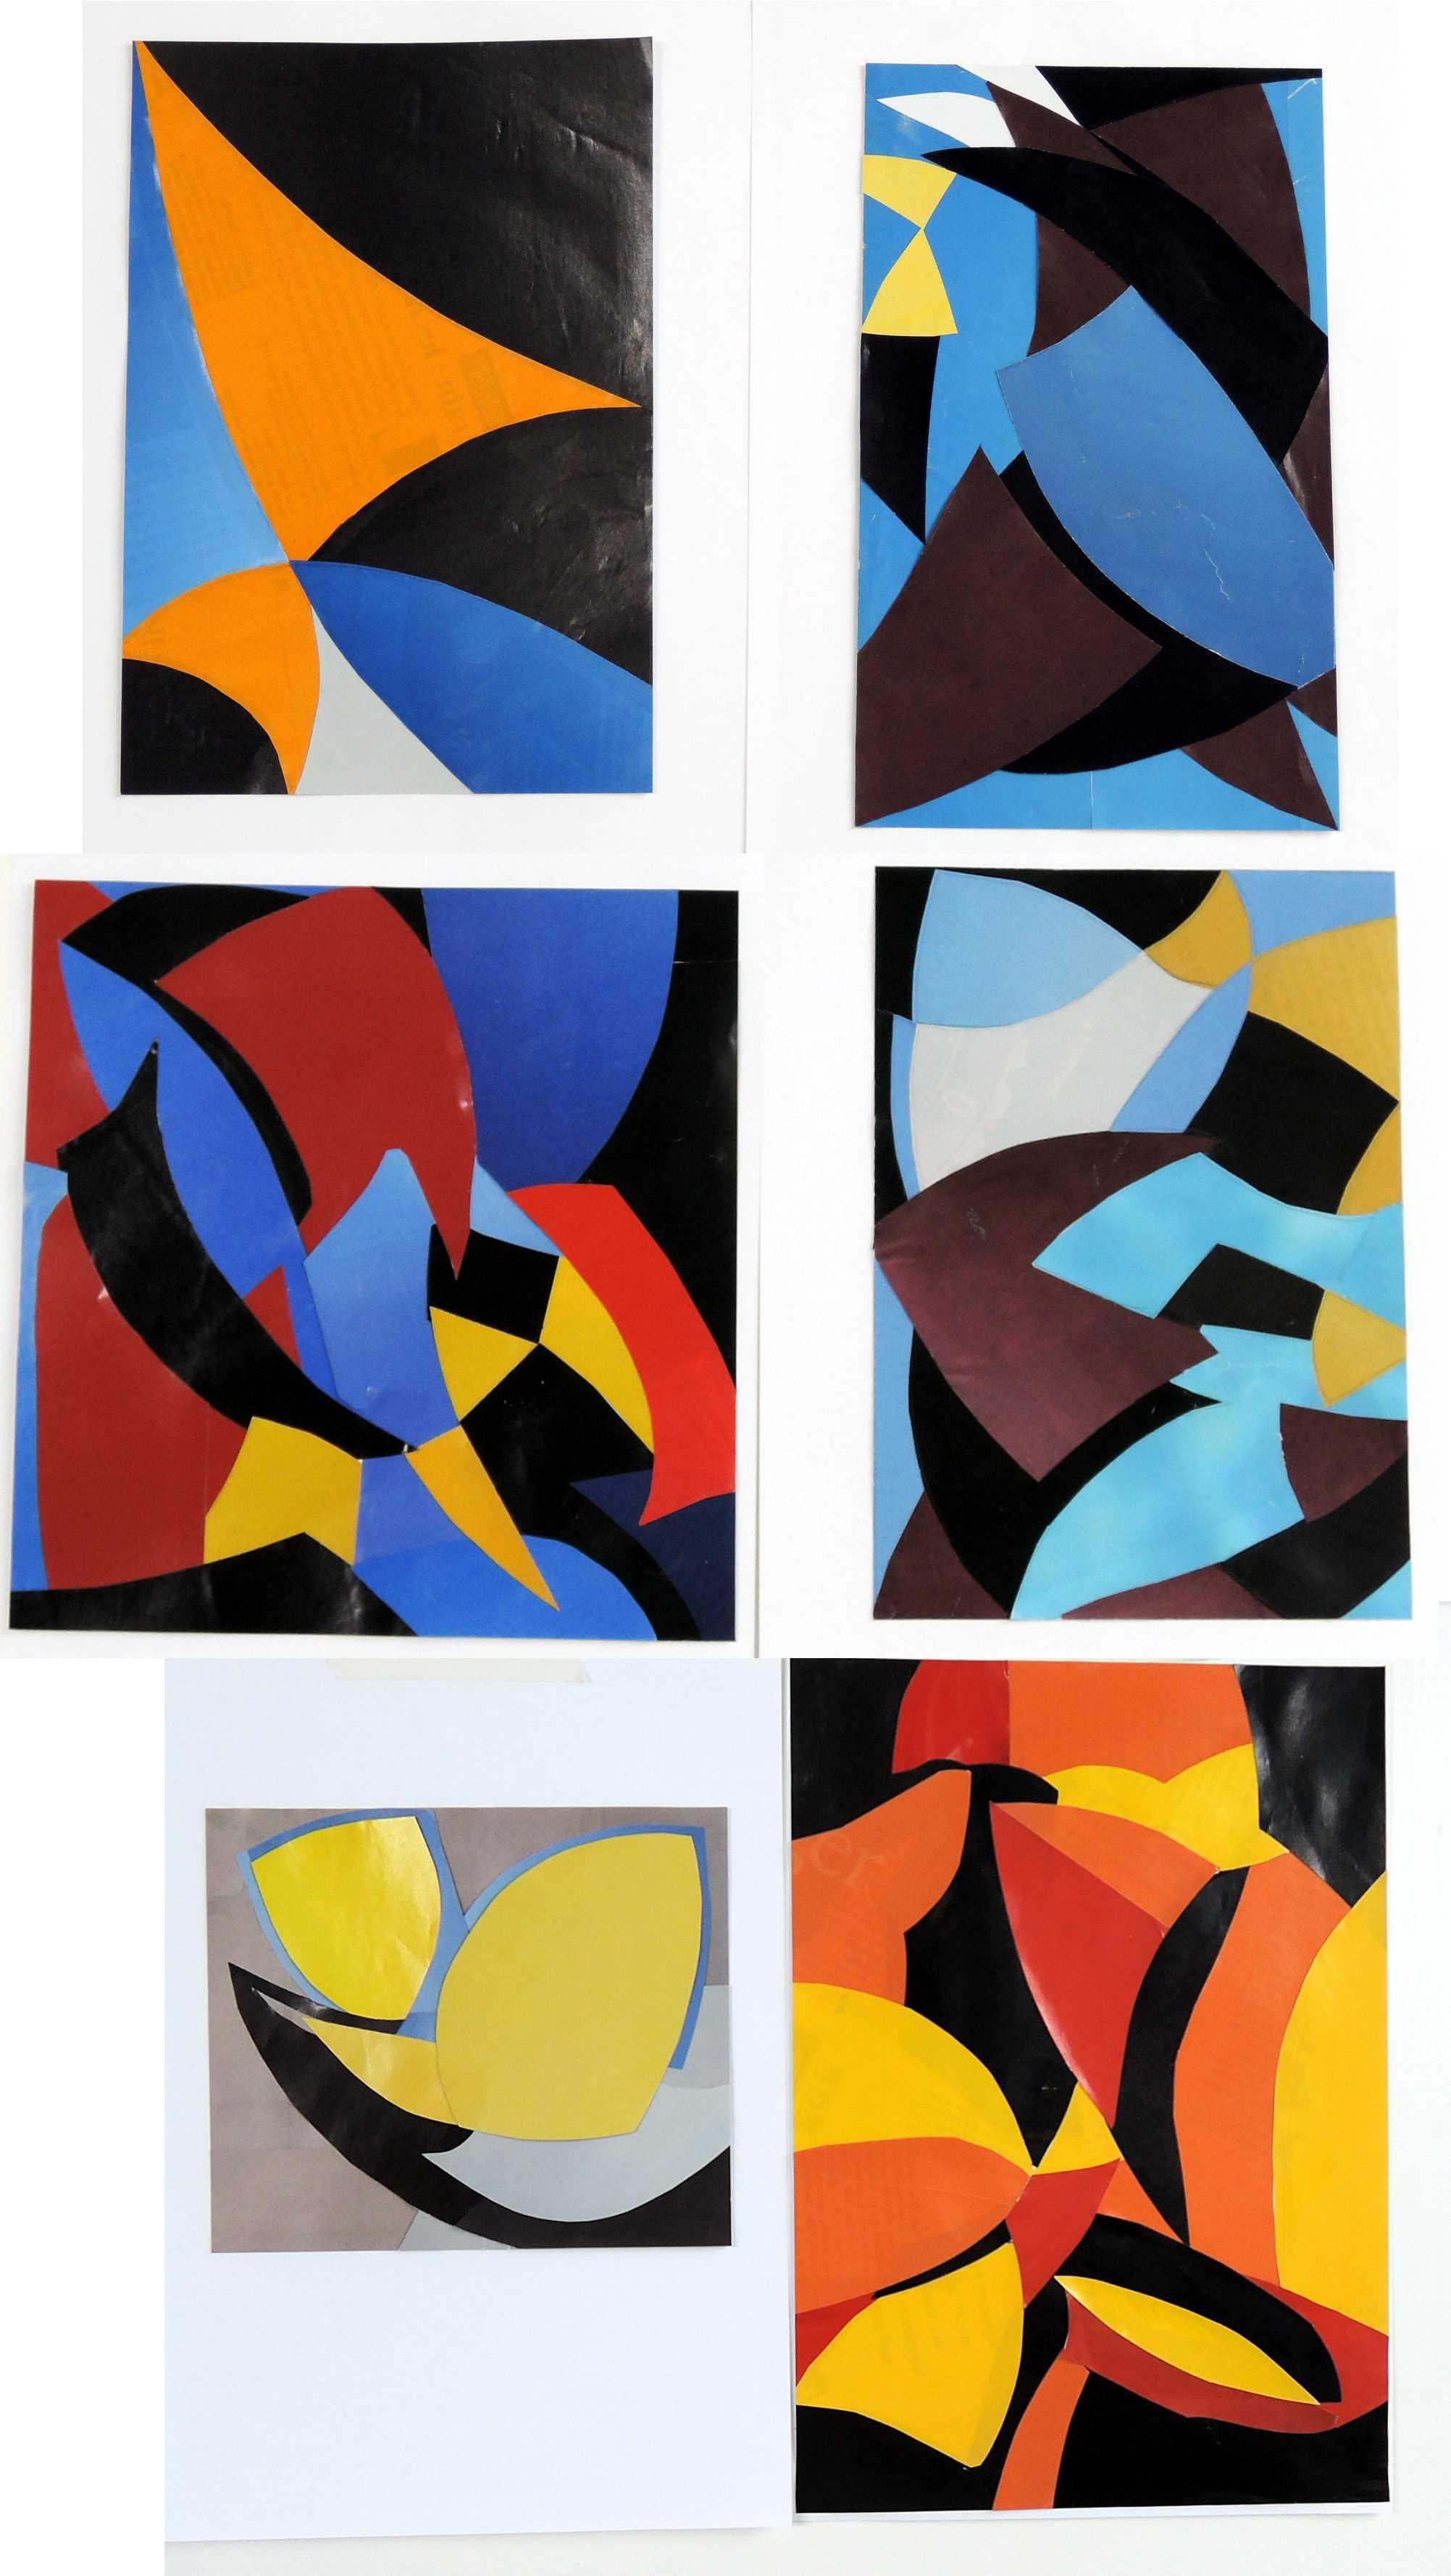 Alfred Reth collages mercredi 18 juin 2014